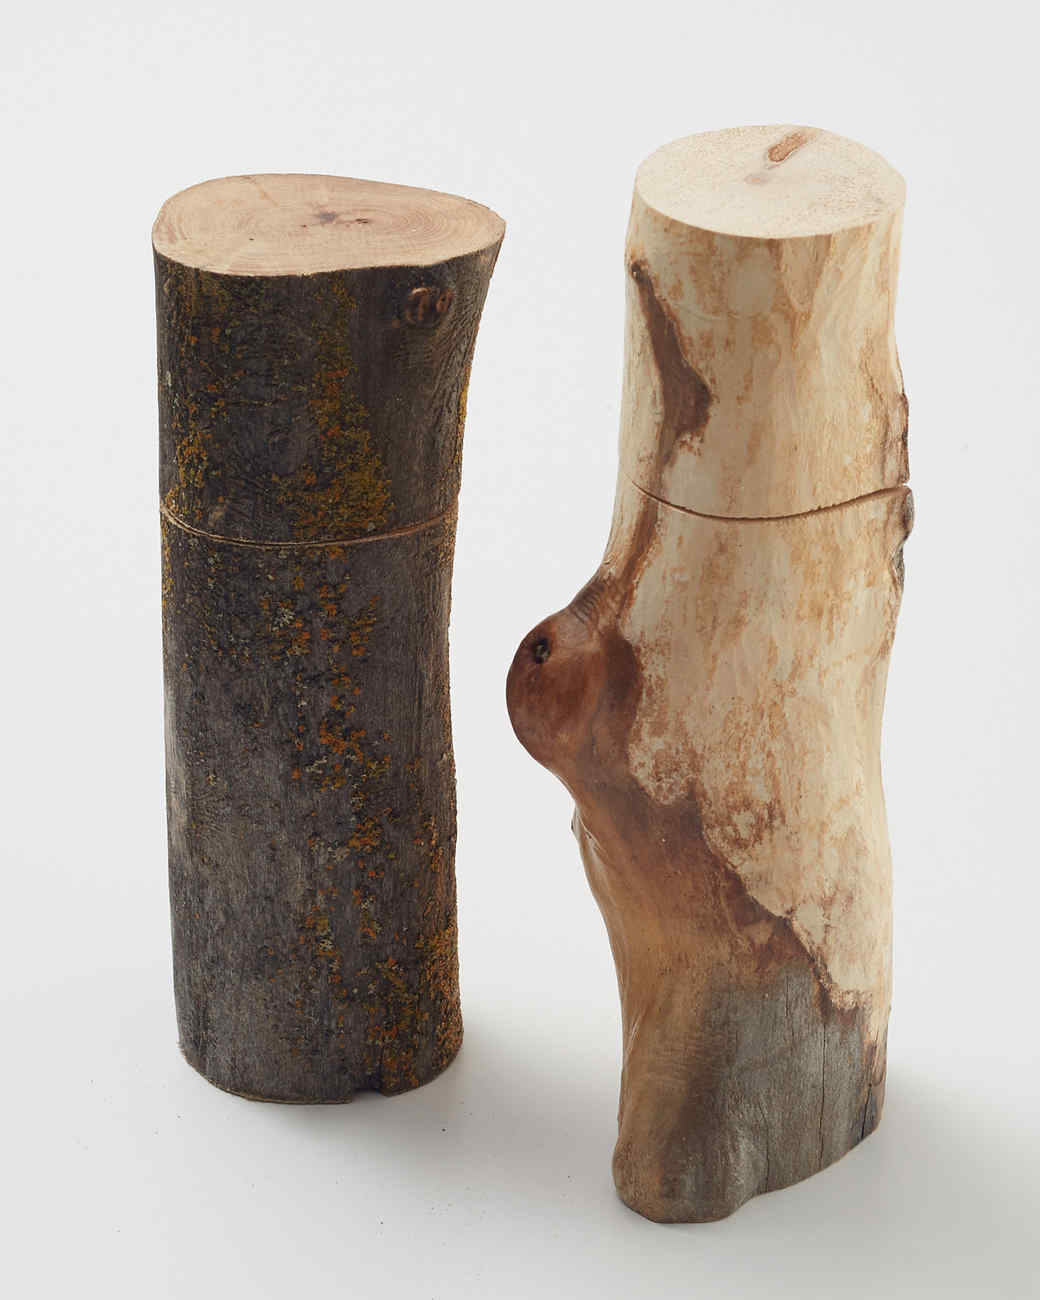 wood-salt-and-pepper-shakers-202-d112494.jpg